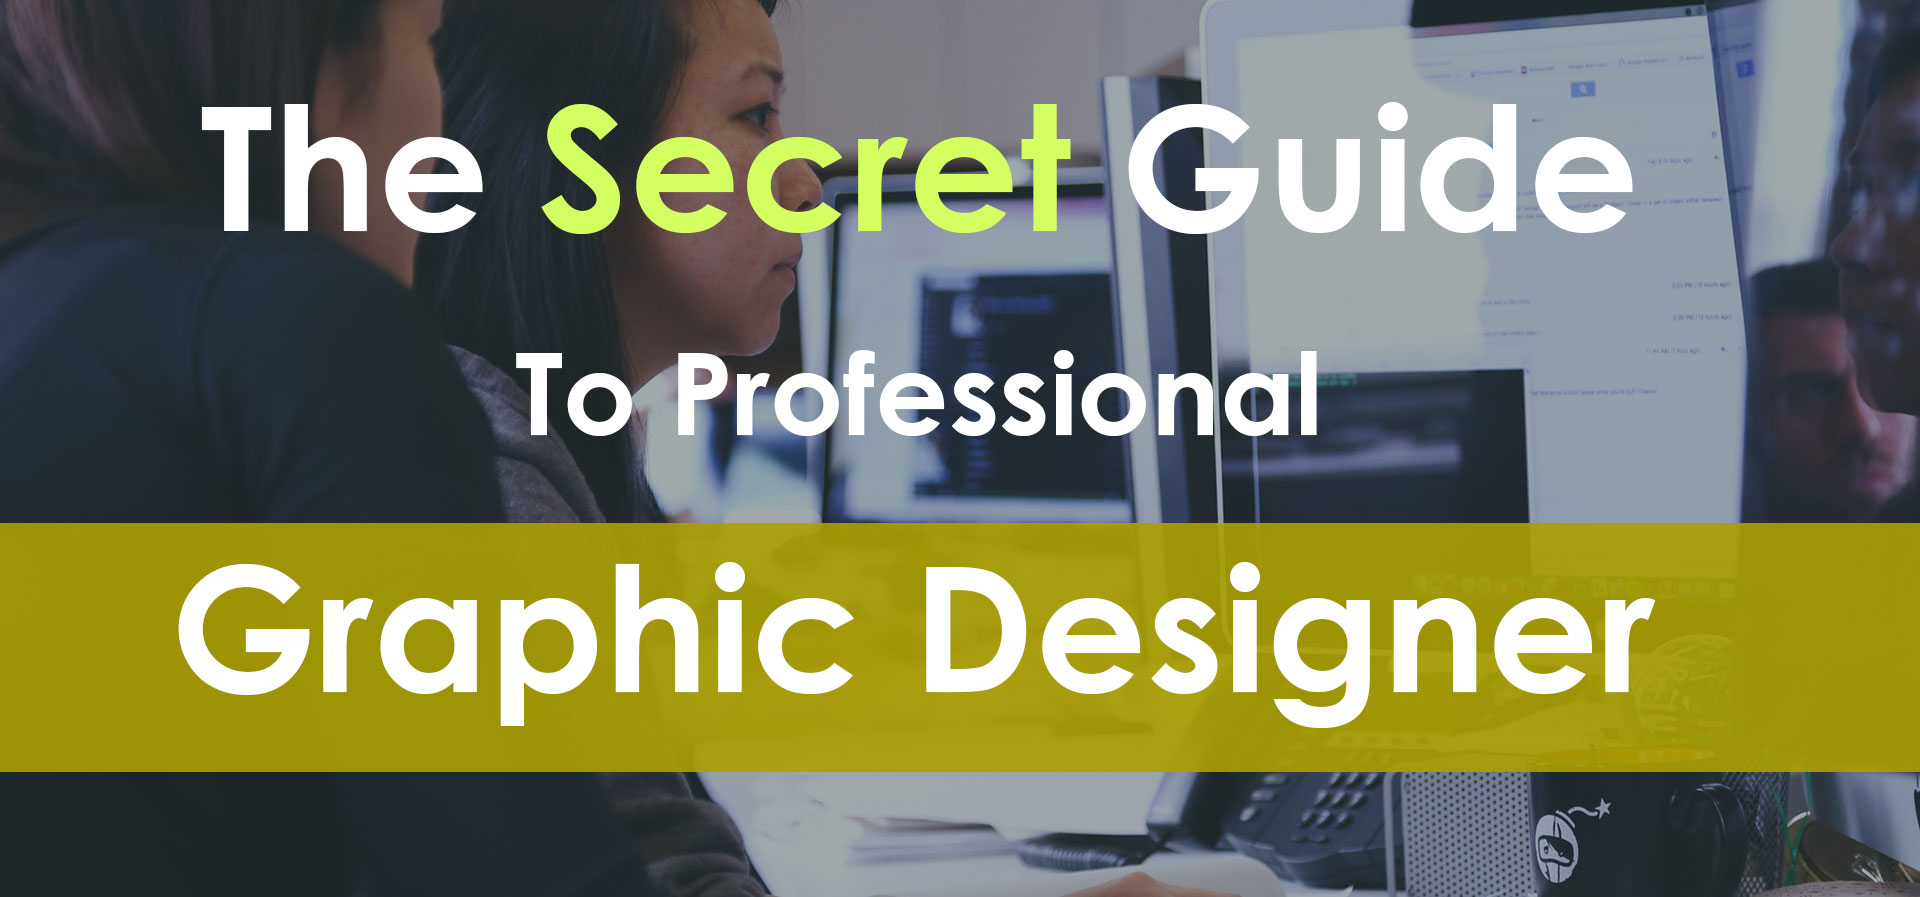 The-Secret-Guide-To-Professional-Graphic-Designer